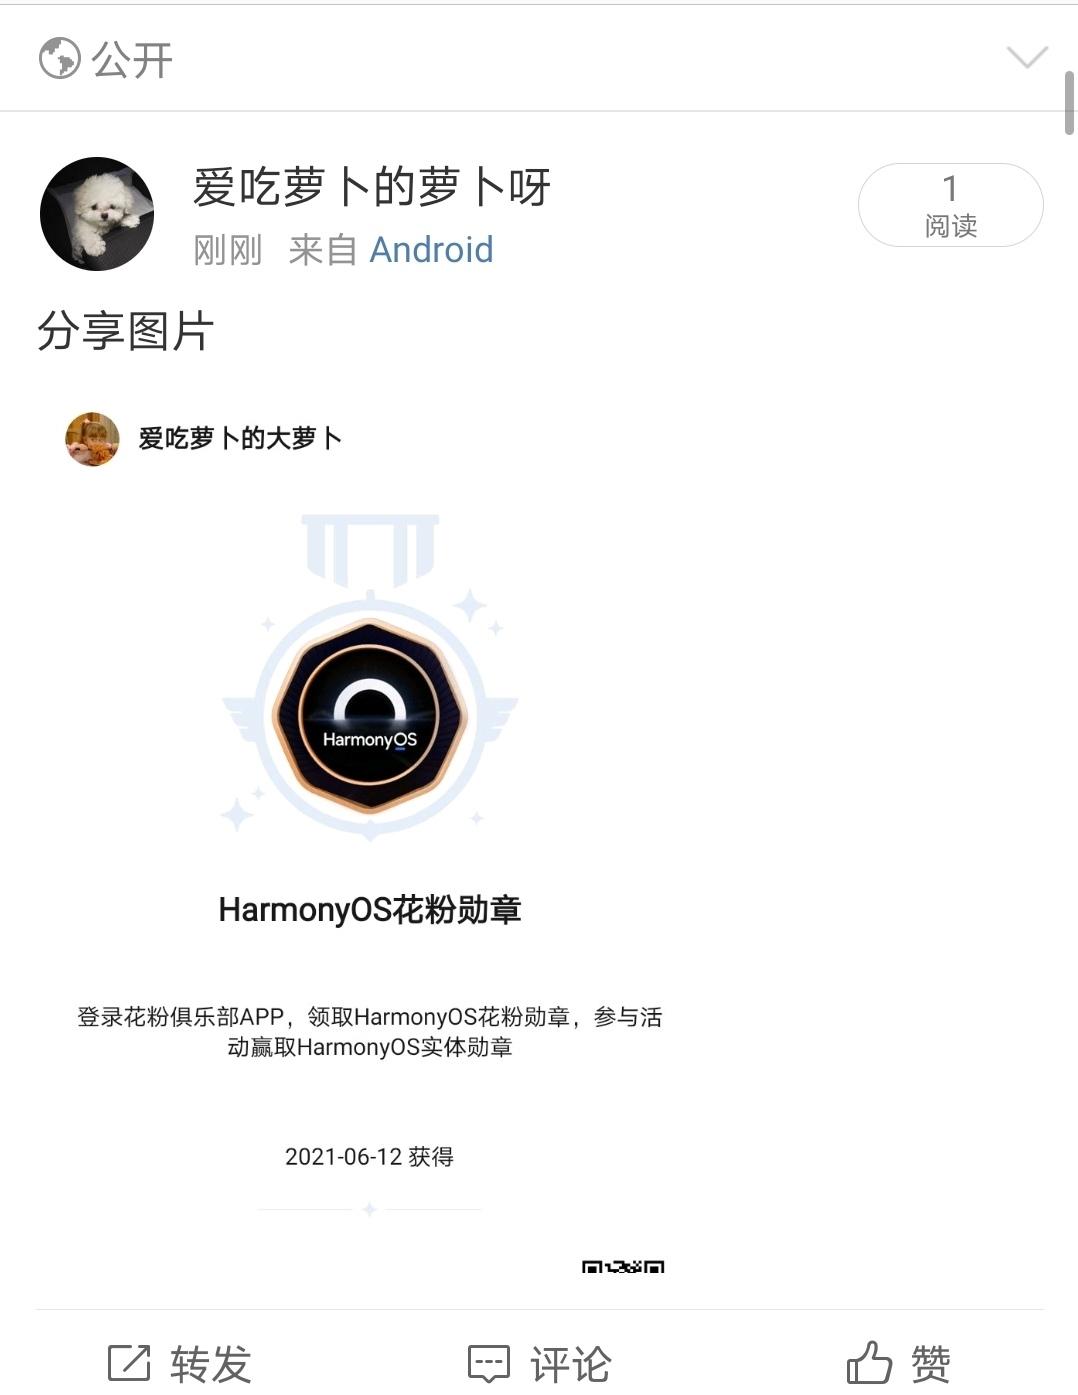 Screenshot_20210612_091758_com.sina.weibo_edit_332212347630557.jpg